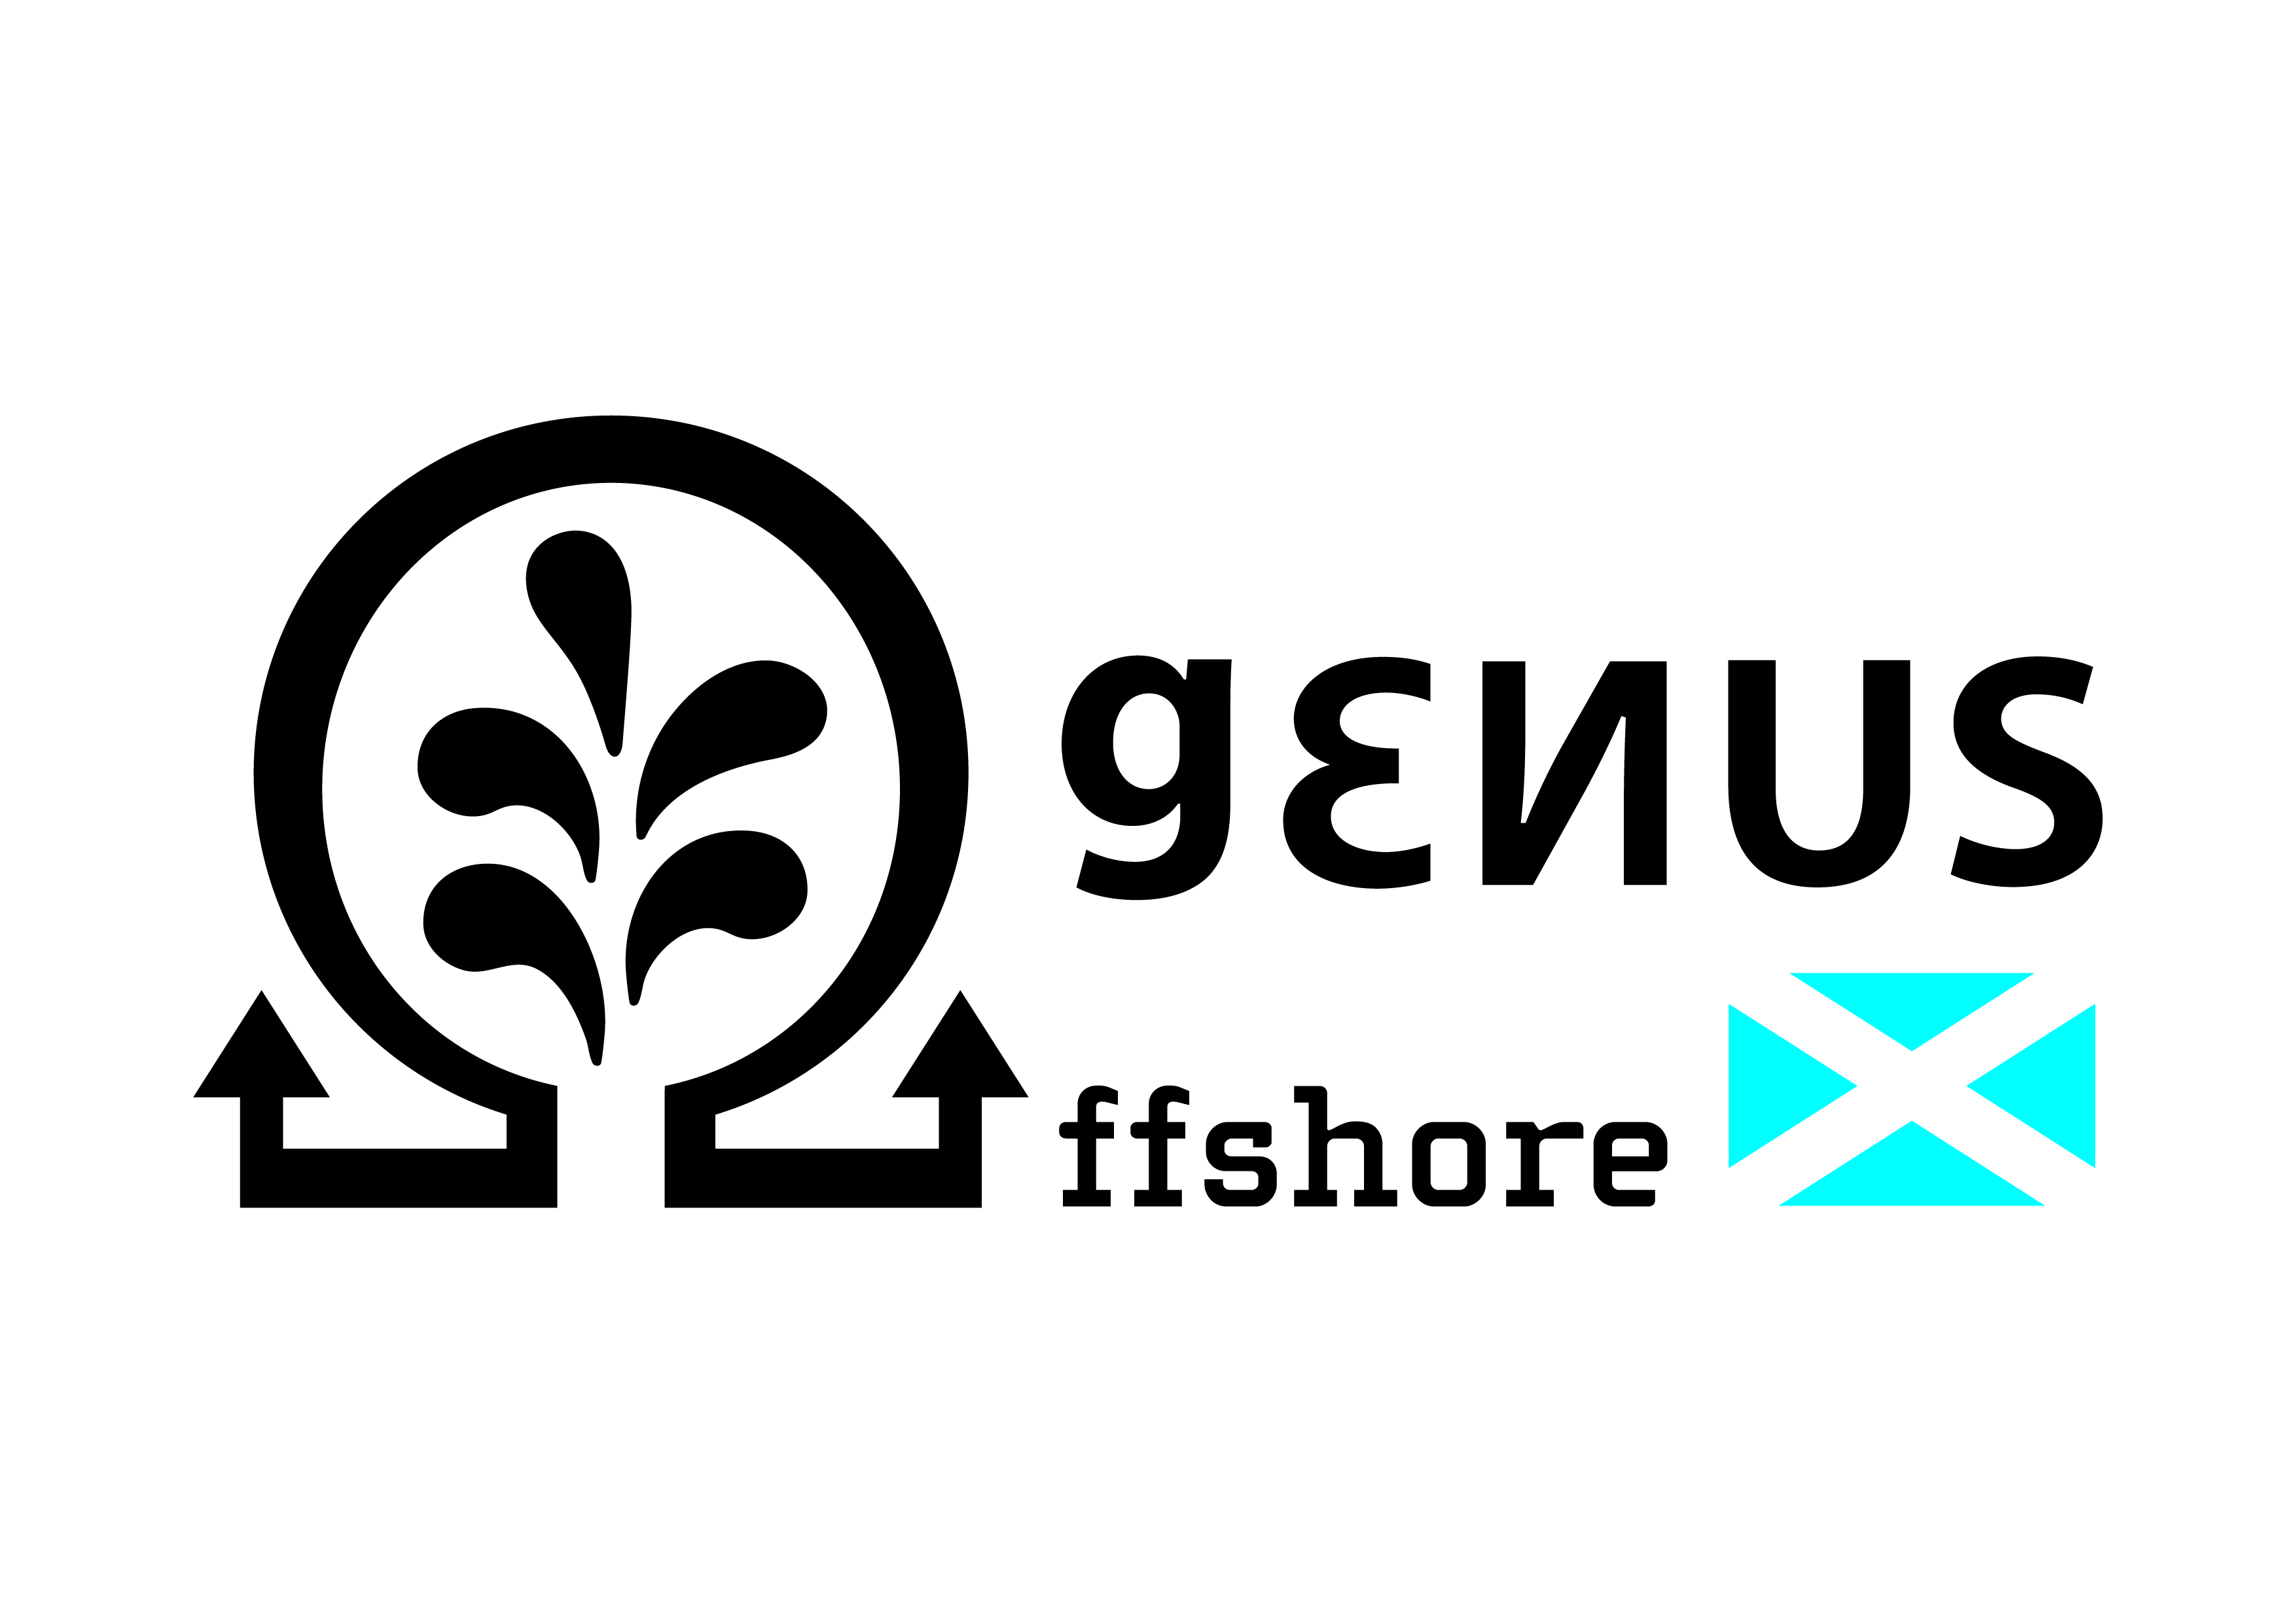 Ogenus Offshore